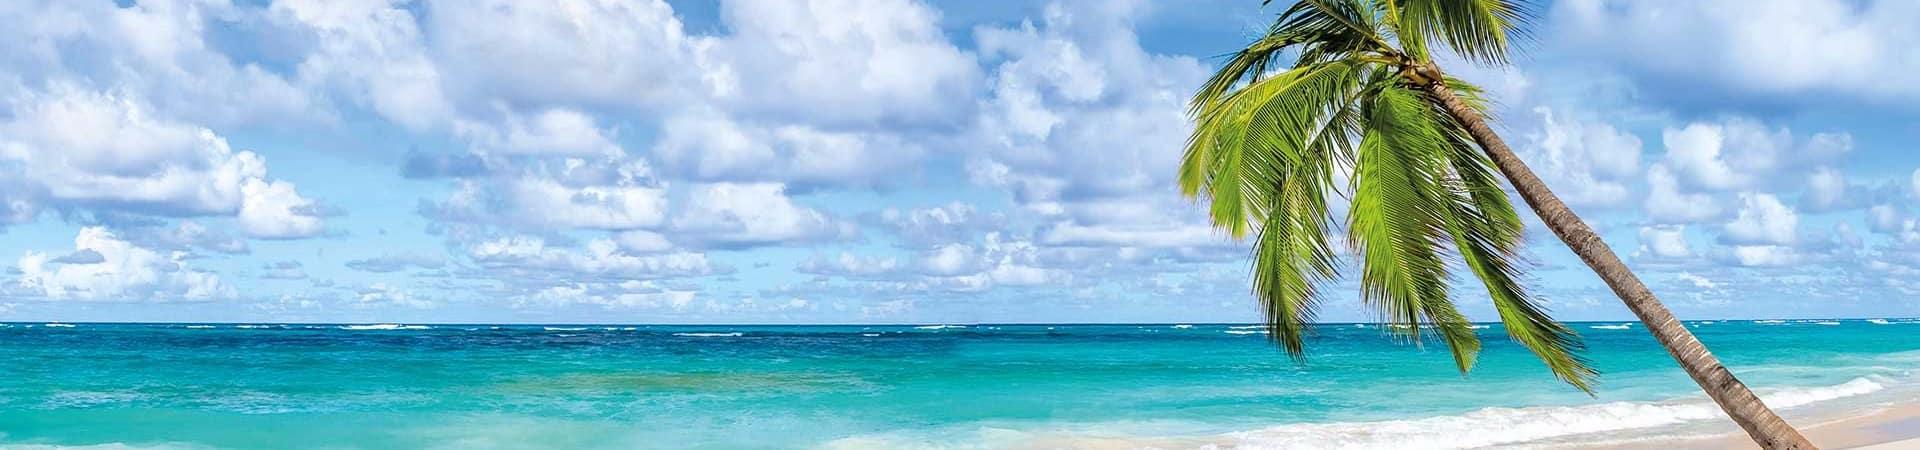 Punta cana banner